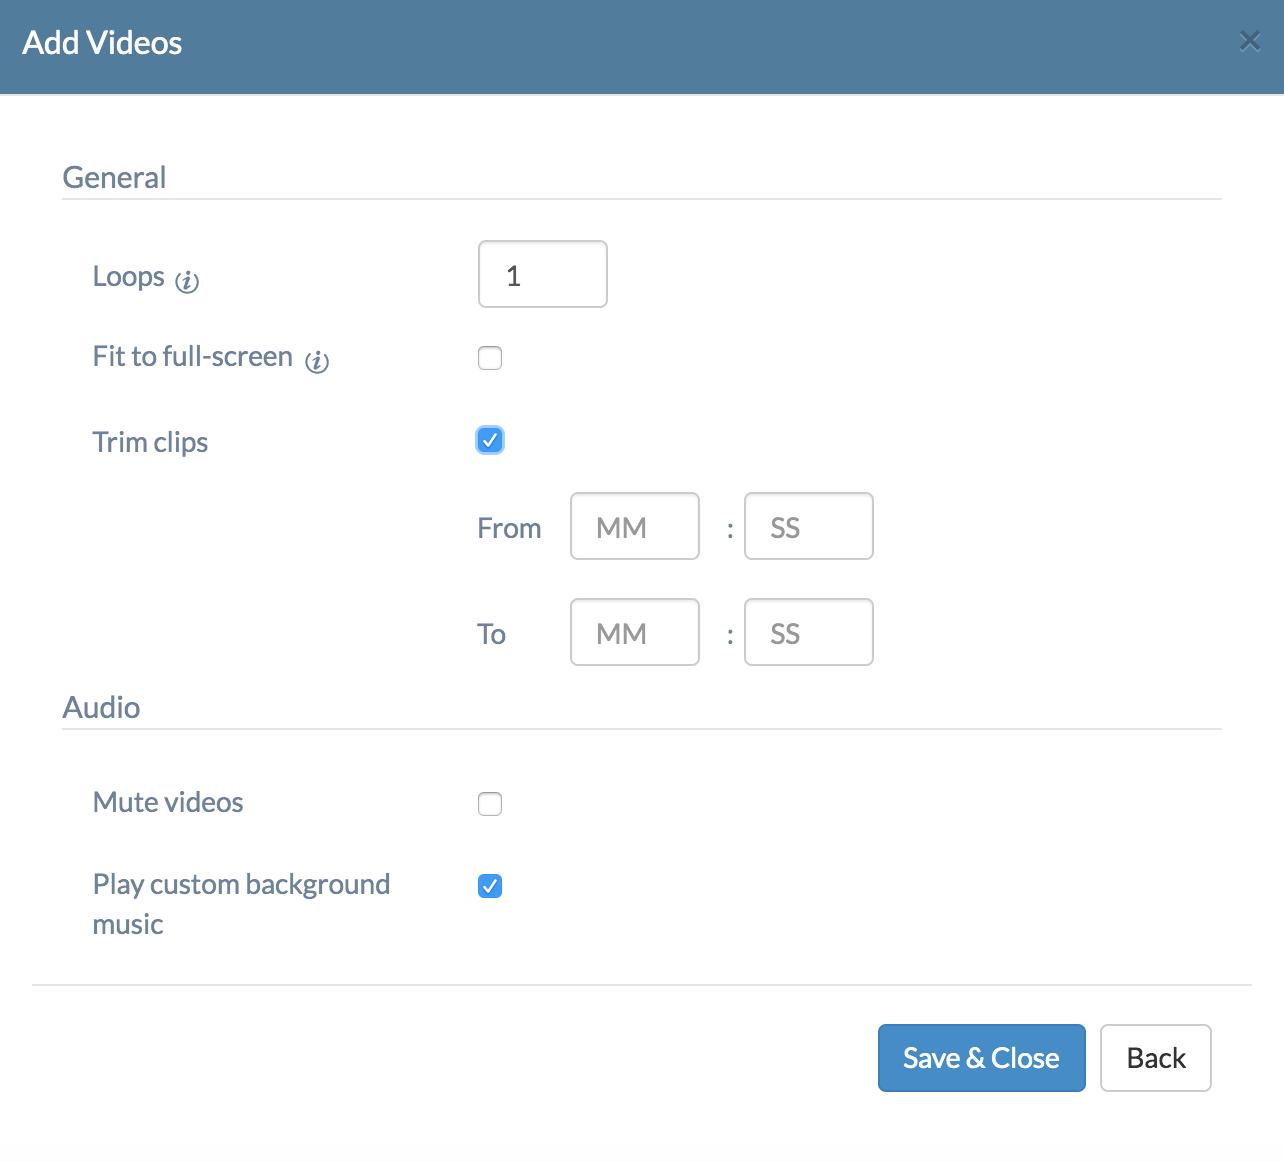 Video Screensaver settings